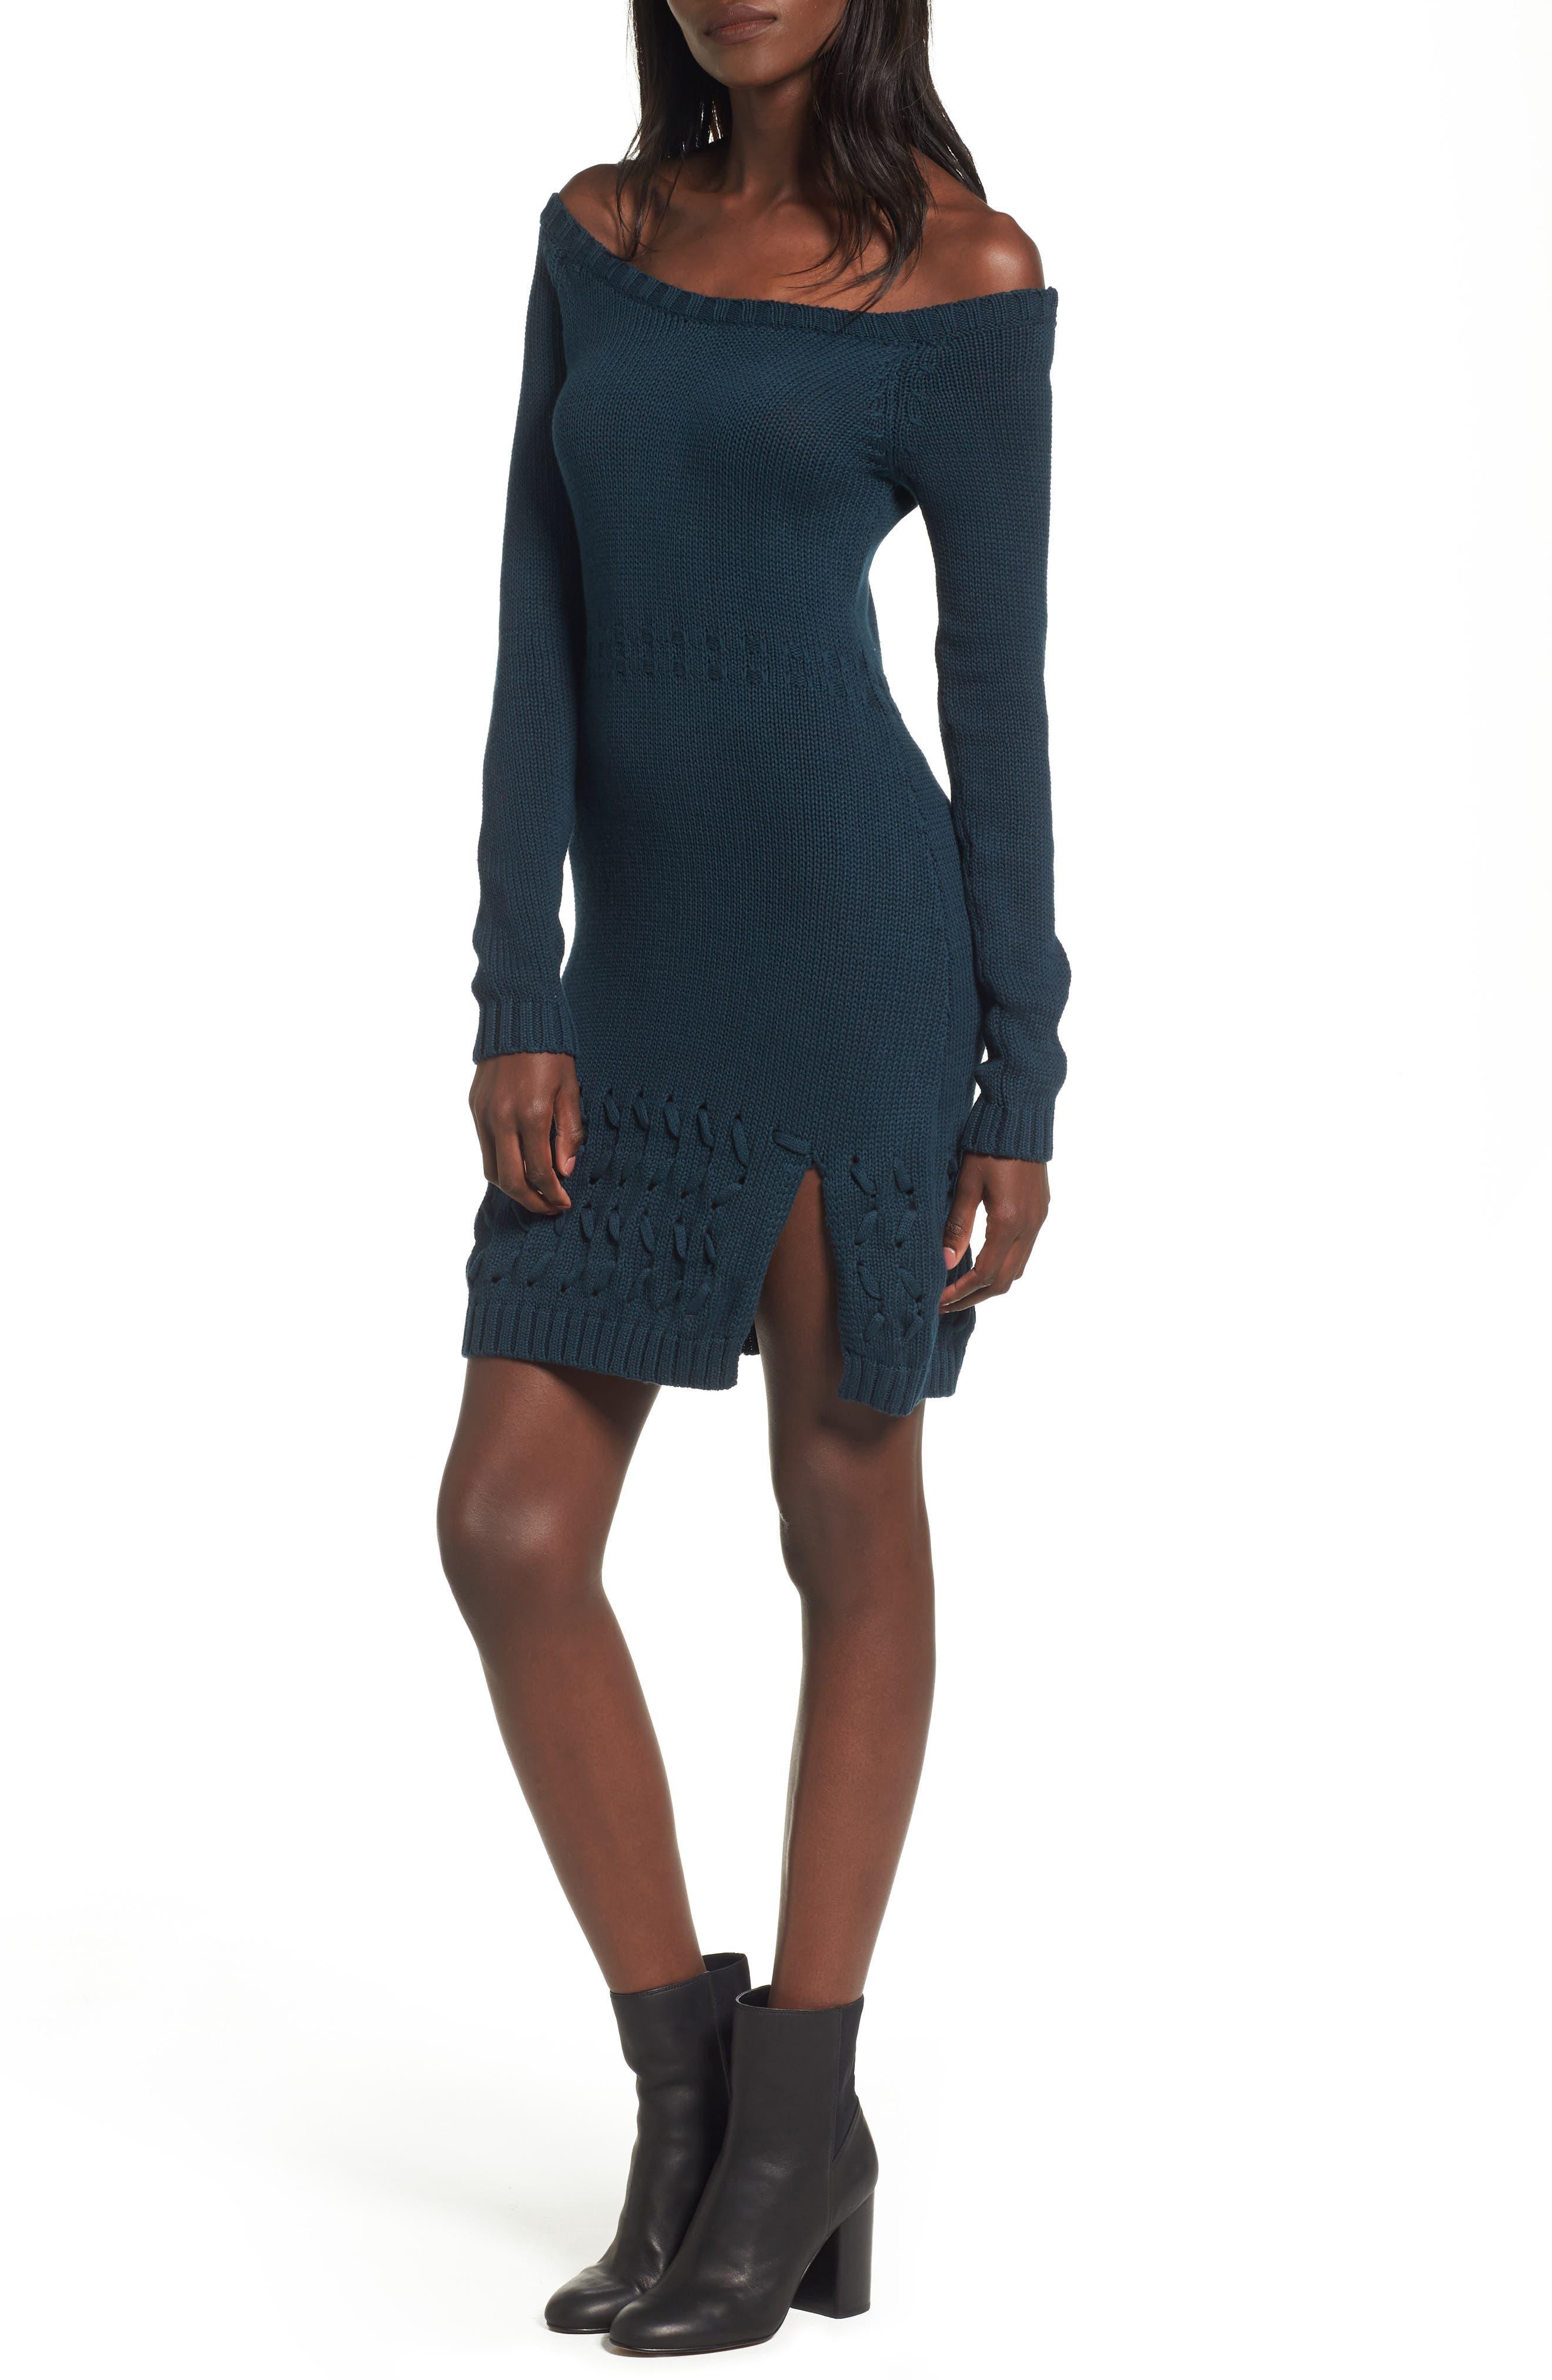 Falling Free Knit Off the Shoulder Dress,                             Main thumbnail 1, color,                             430